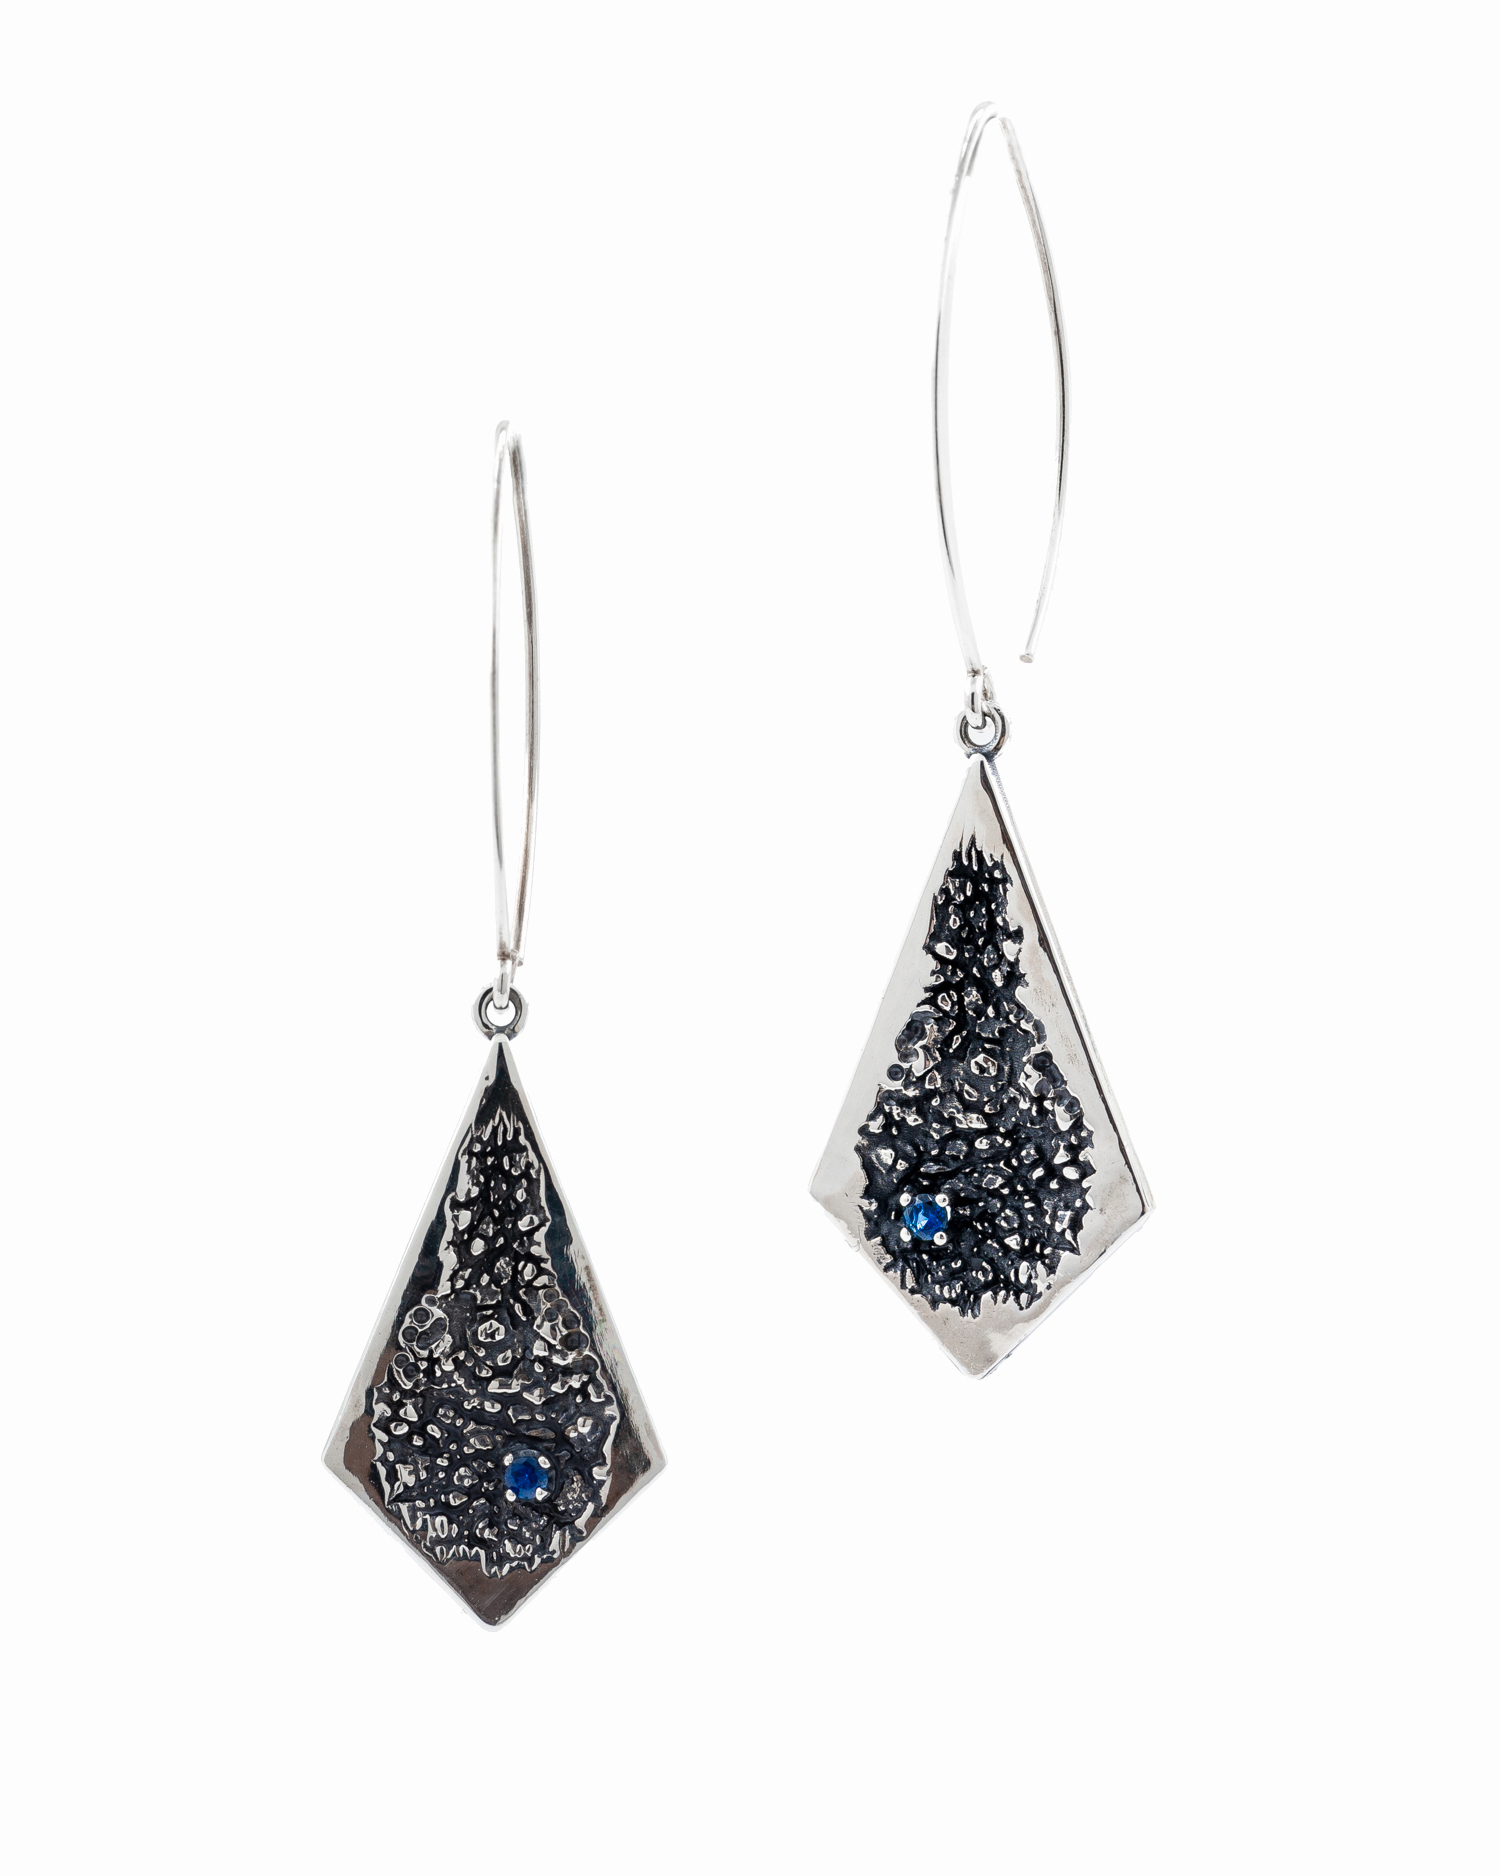 Absence Earrings : Sterling silver, Australian blue sapphire, patina.